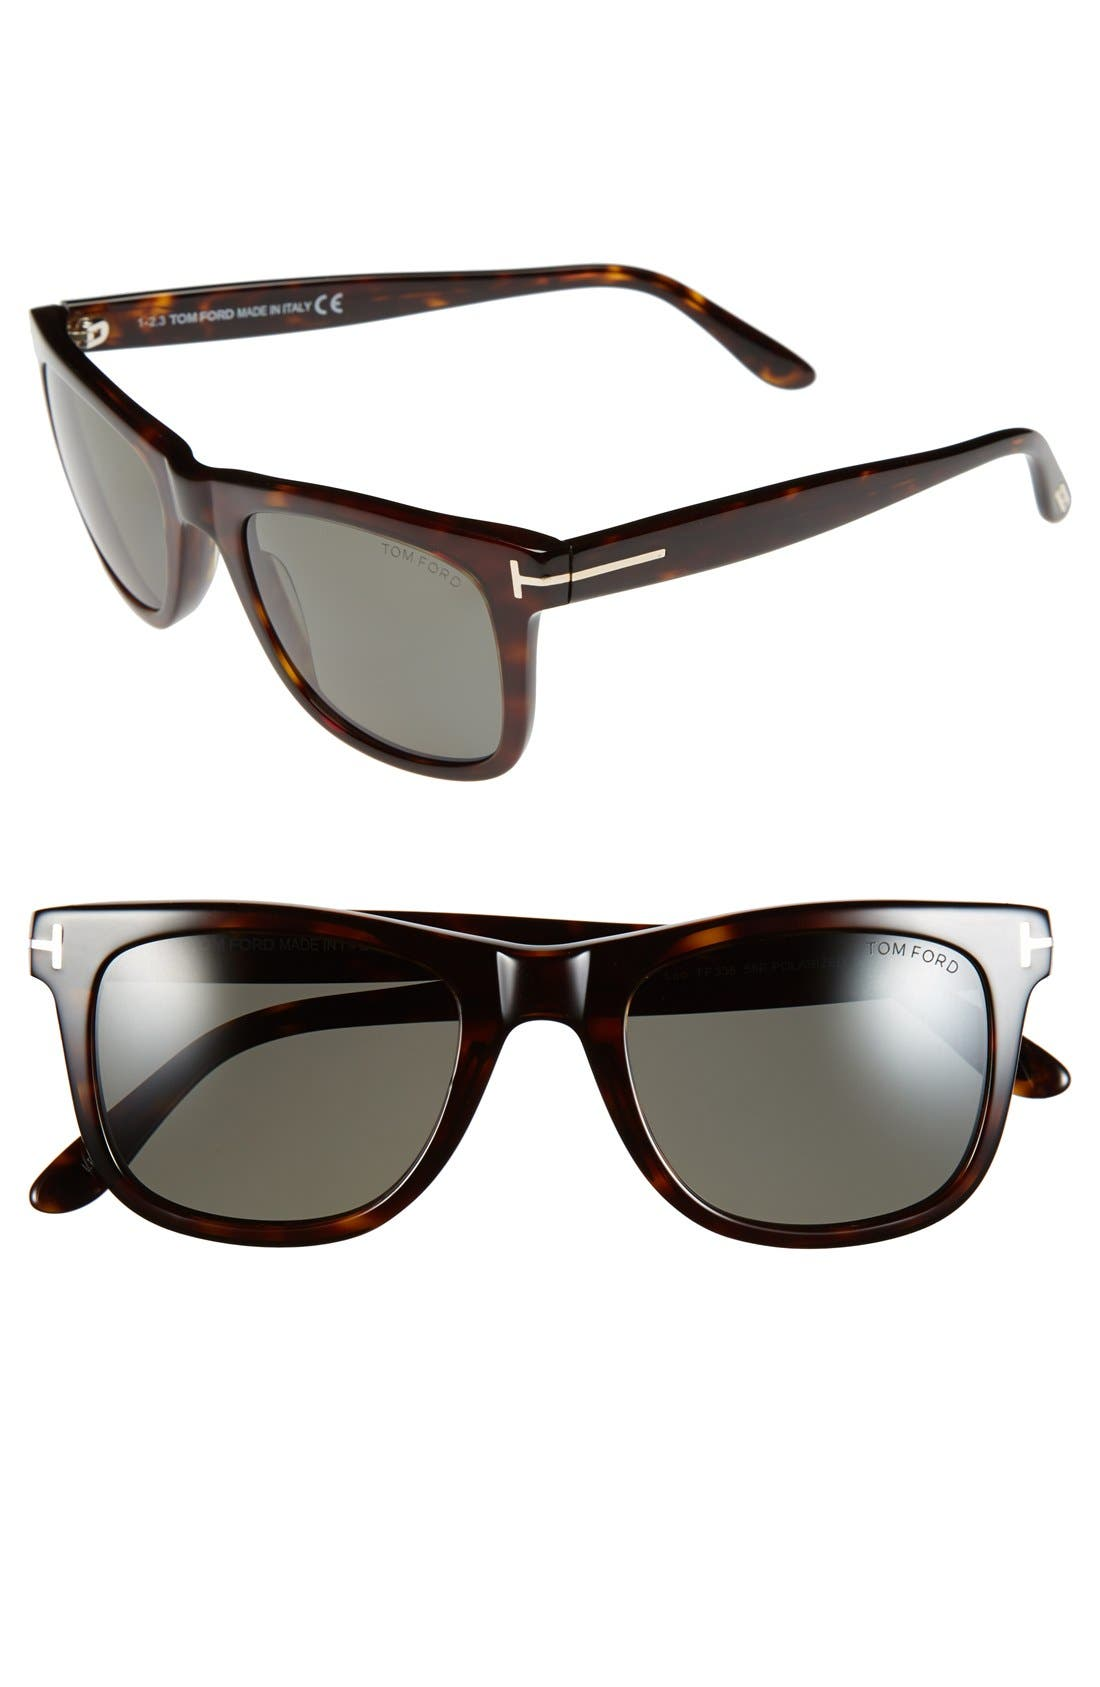 Mens Anna Sunglasses Tom Ford zbjhA4B